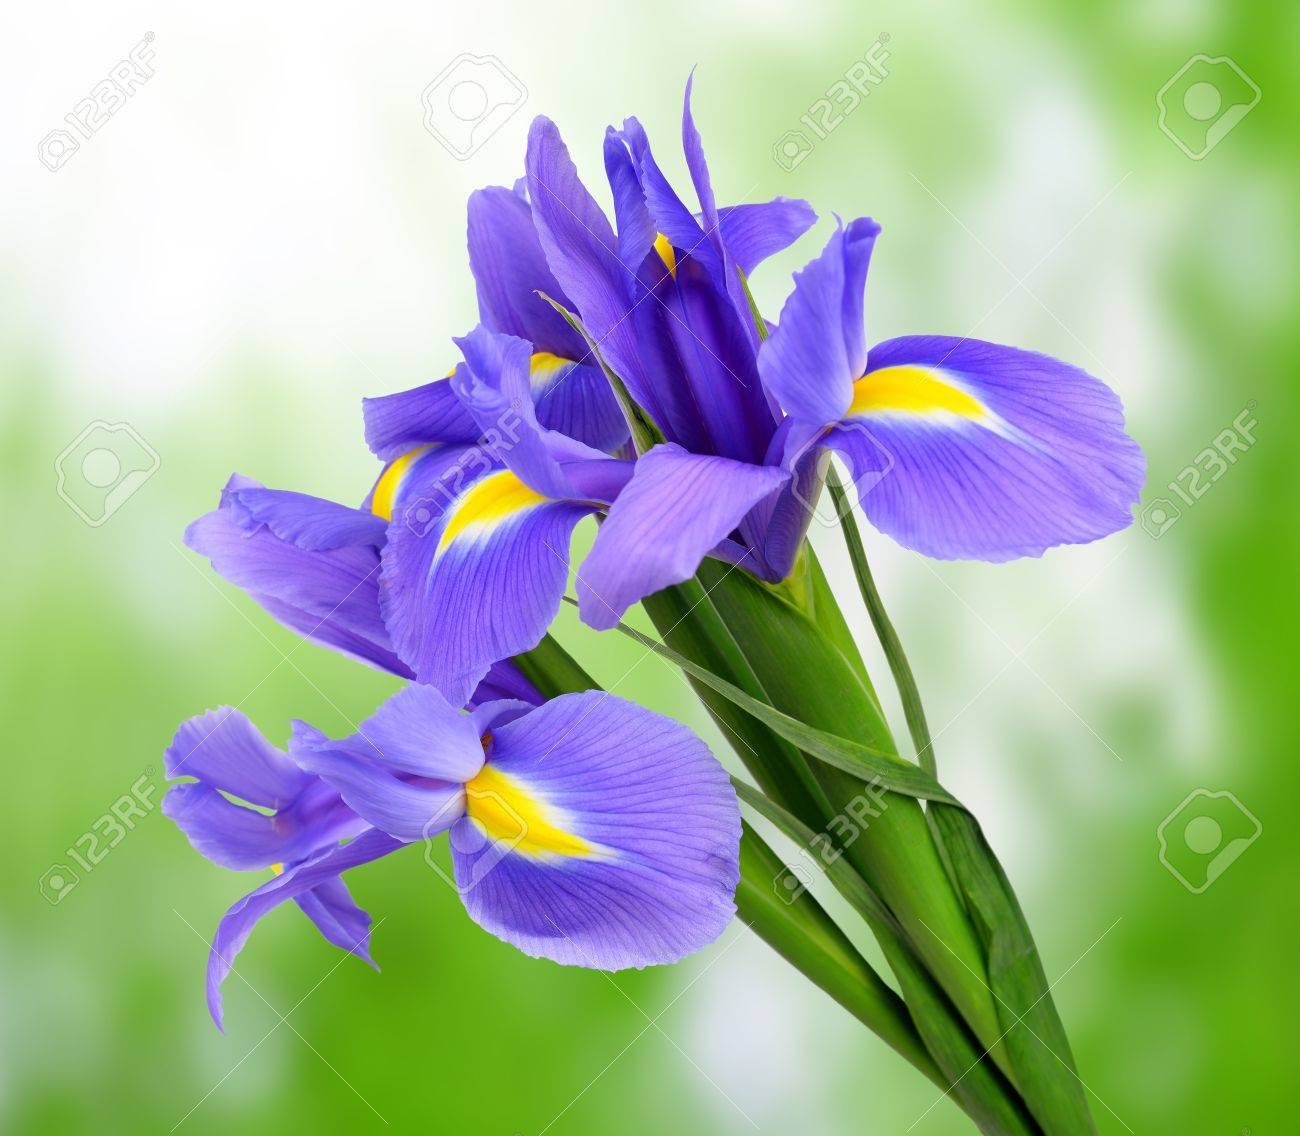 Purple iris flower on green background stock photo picture and purple iris flower on green background stock photo 19431851 izmirmasajfo Images